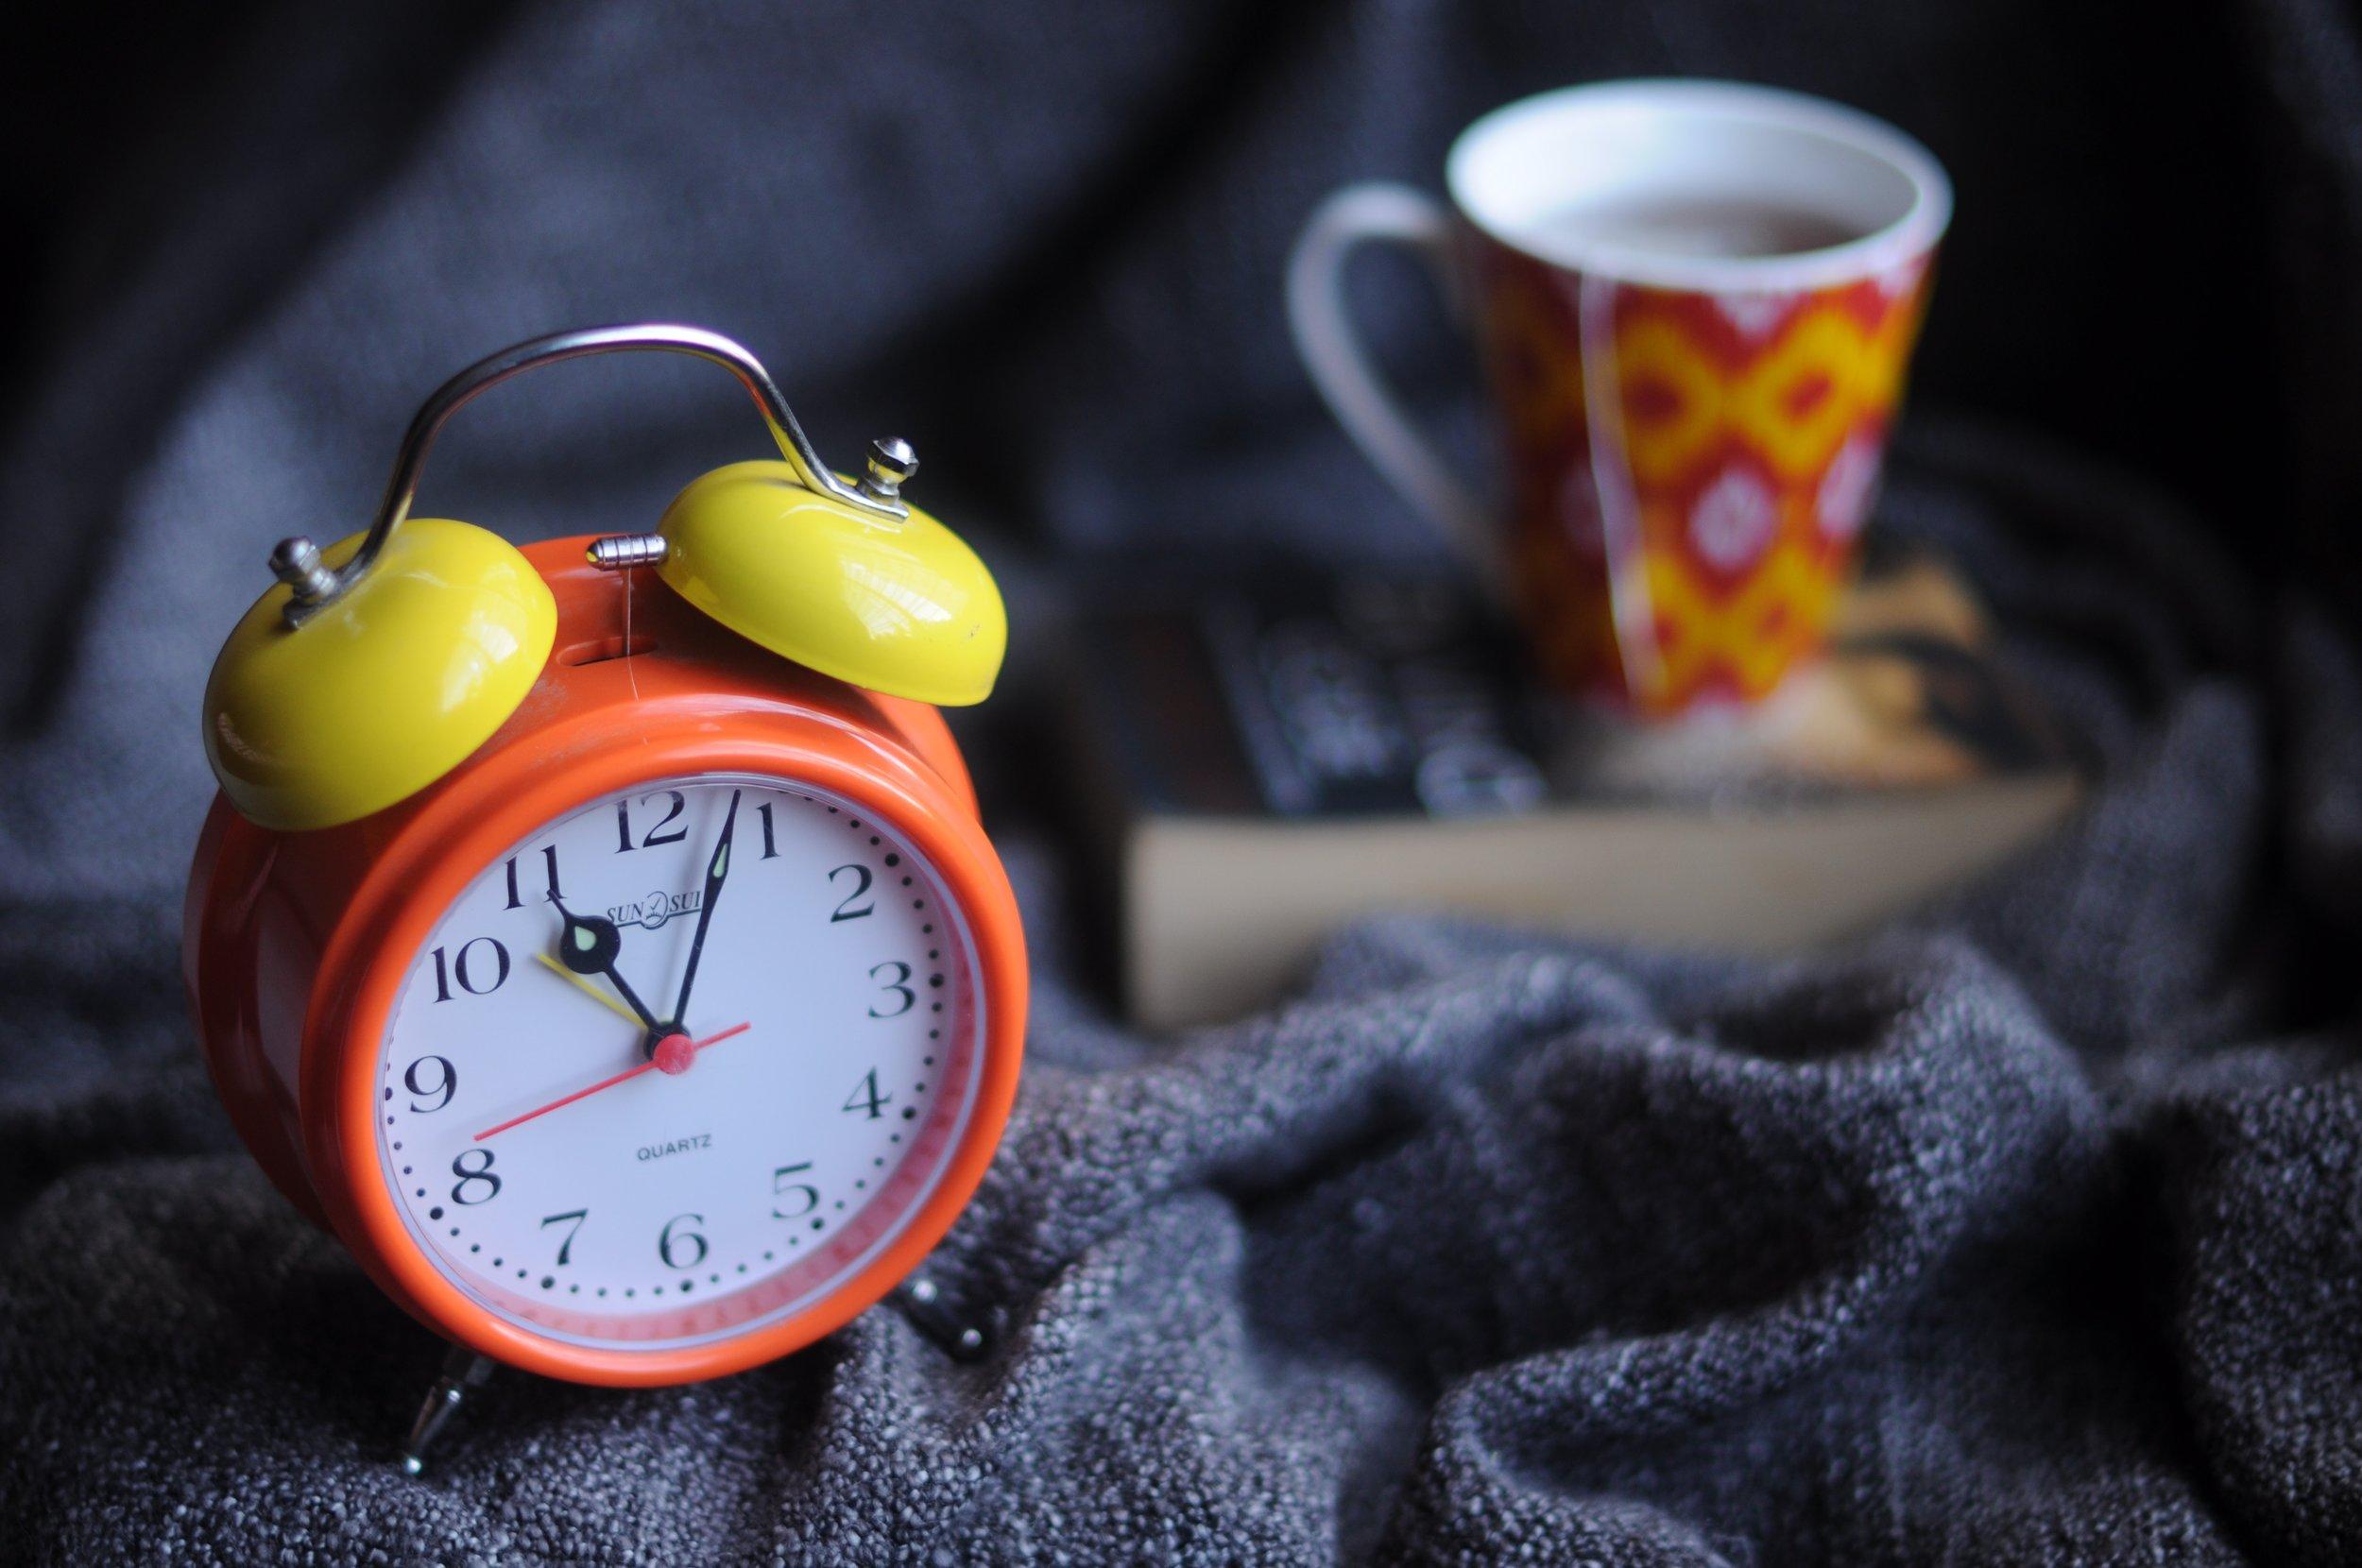 sleepquality-improvingsleep-improvinghealth.jpg